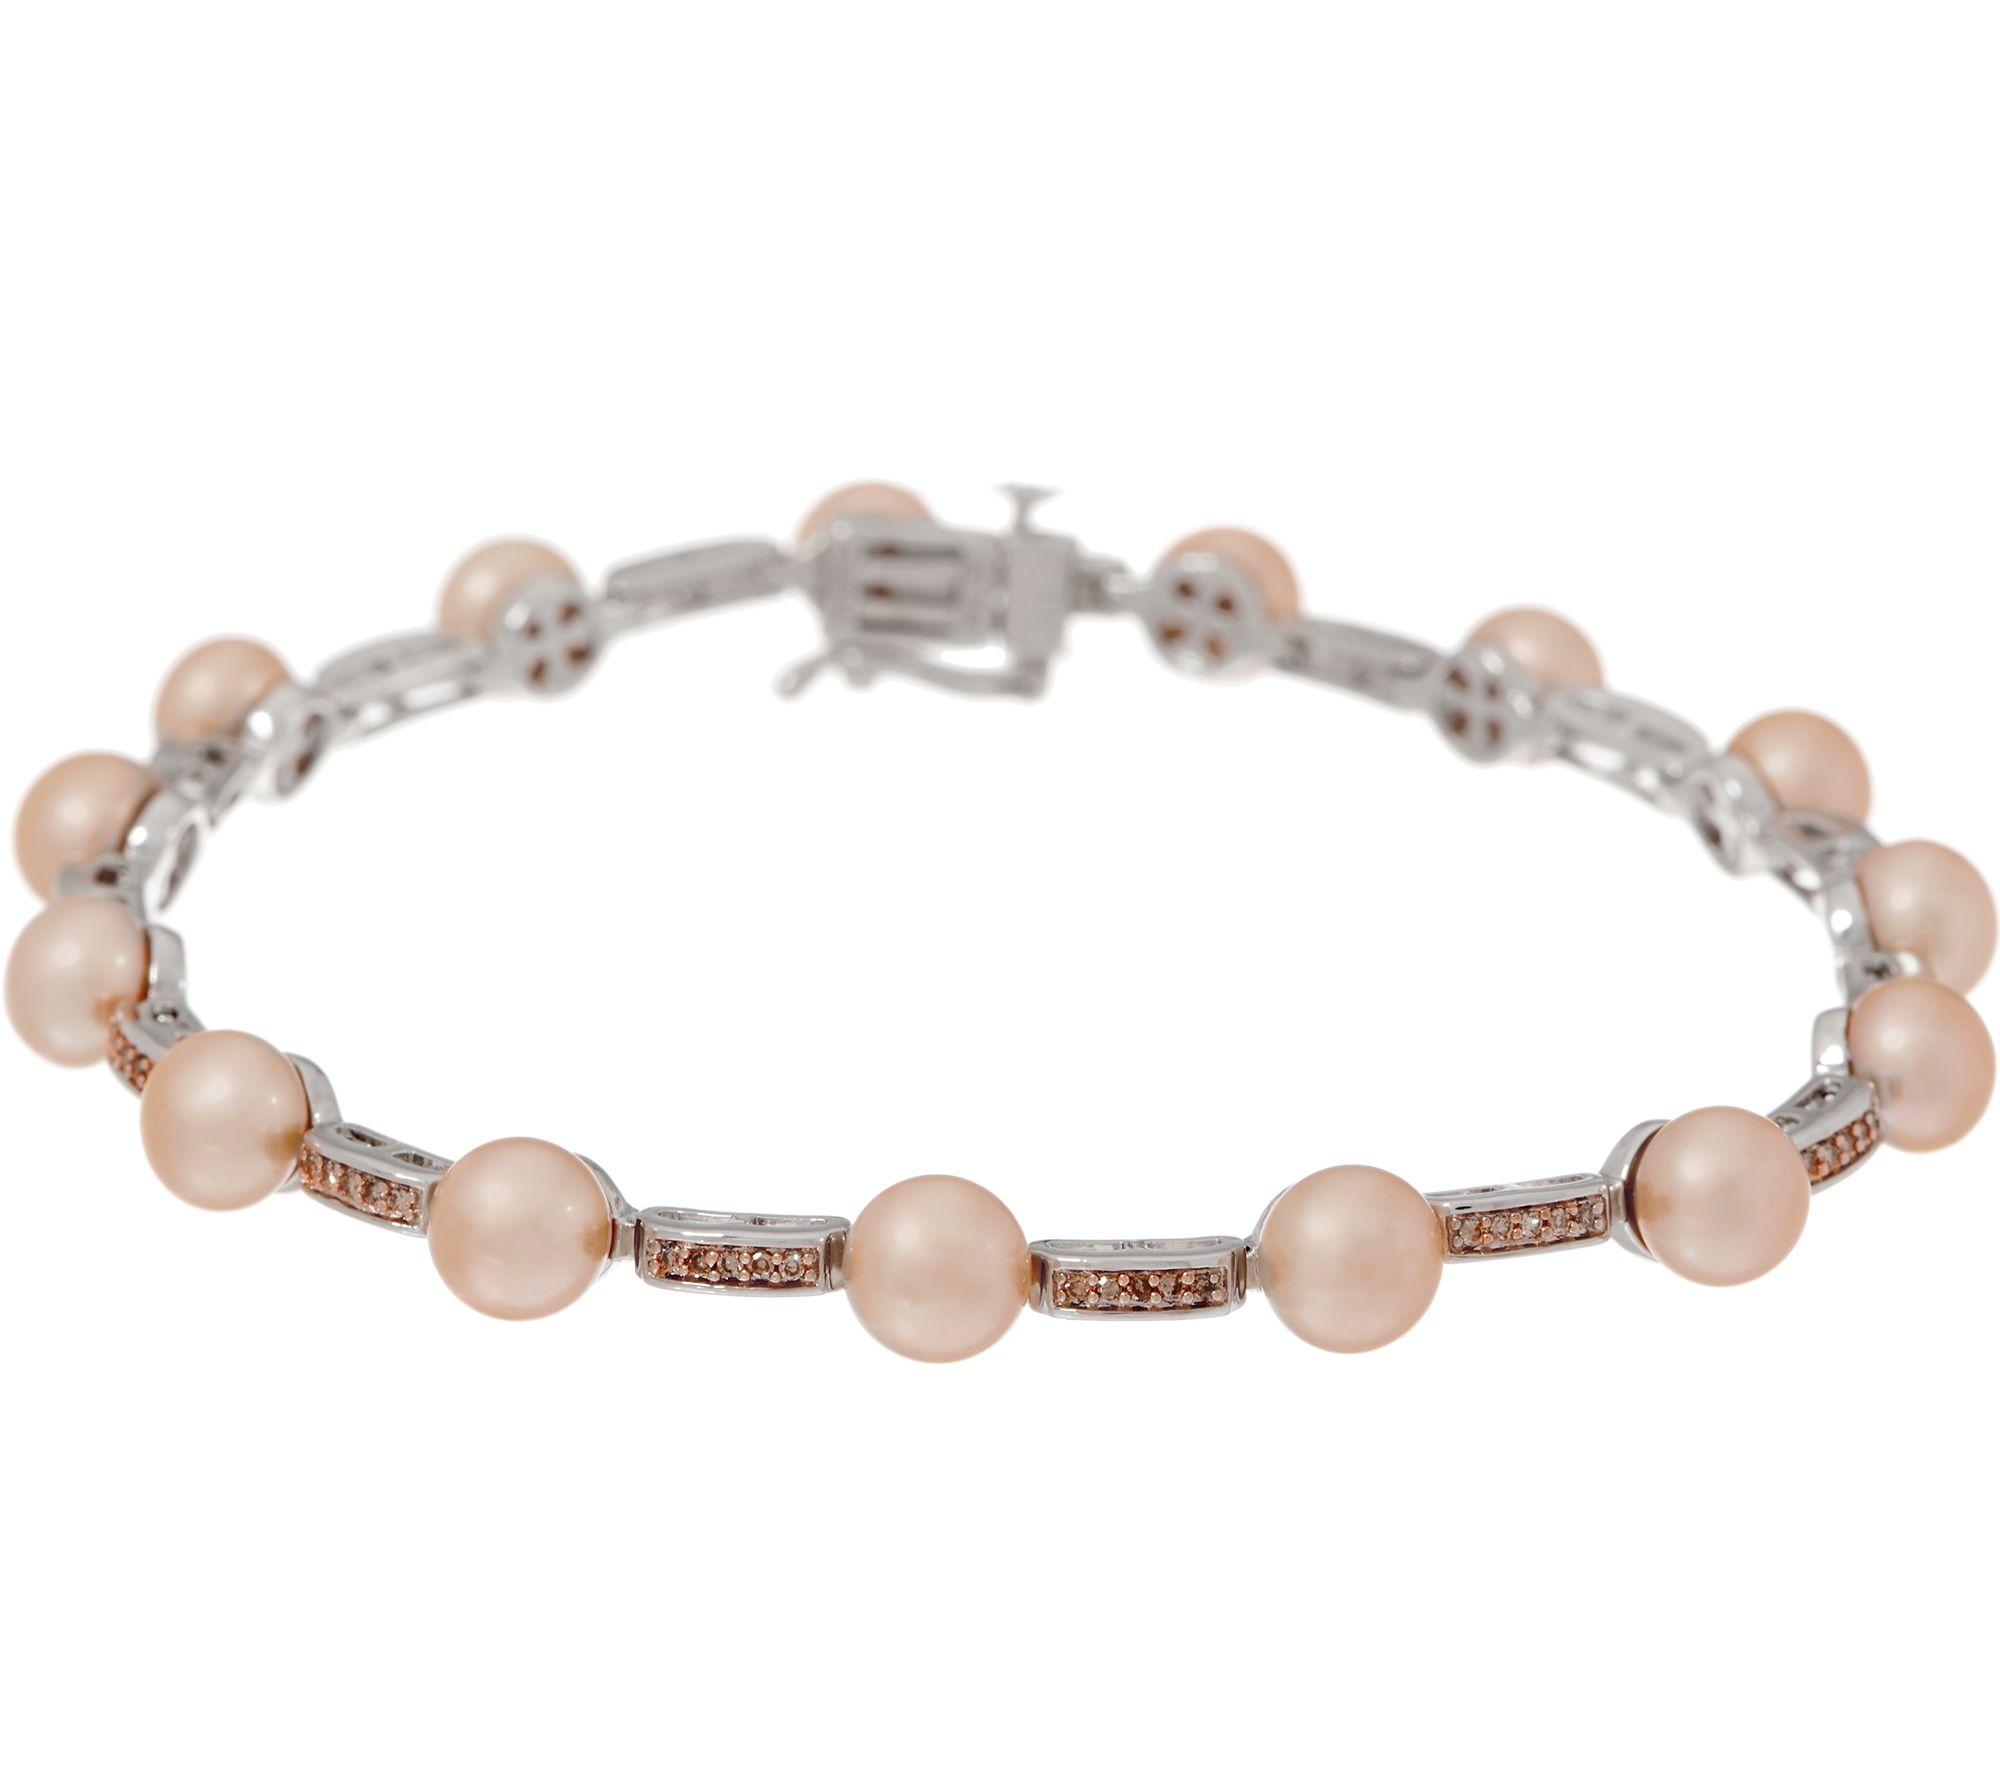 Honora Cultured champagne couleur perles stretch bracelet 6.5 mm